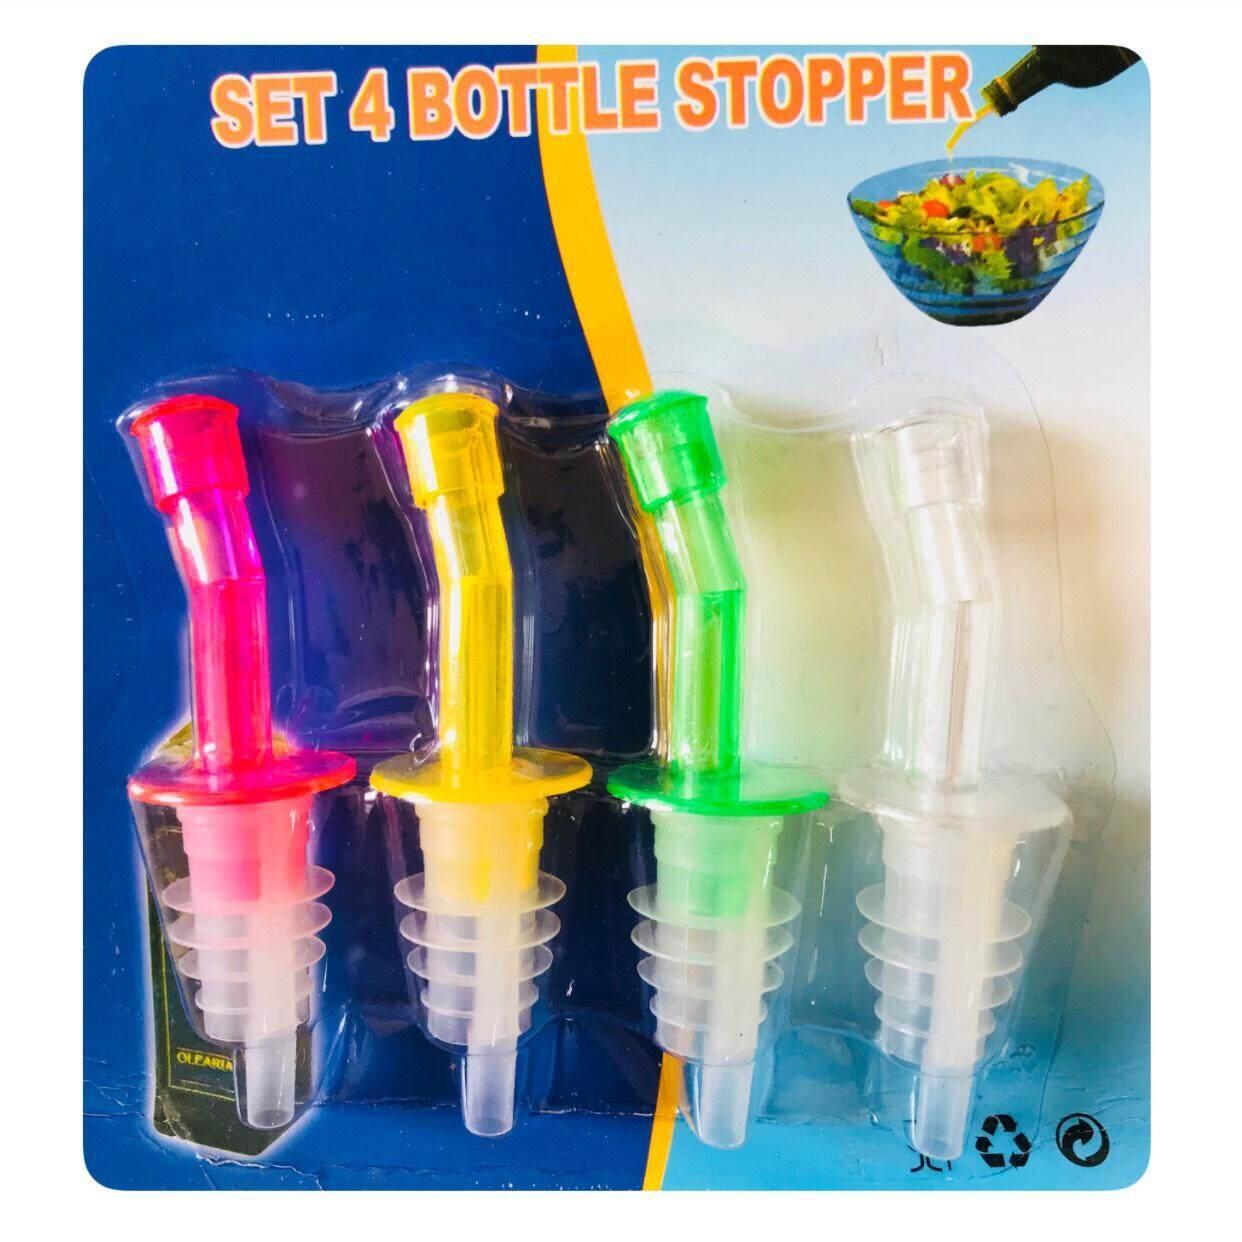 Namita Bottel Stopper อุปกรณ์รินเครื่องดื่ม จุกขวดไวน์ .